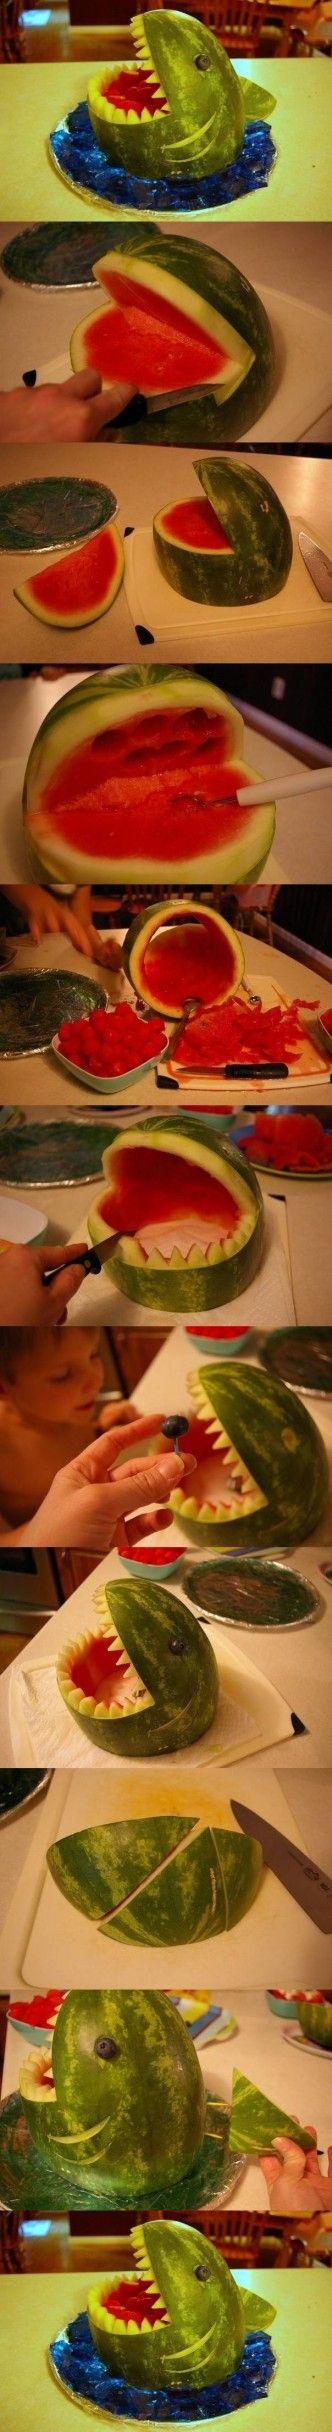 DIY Watermelon Shark Carving Internet Tutorial DIY Projects #beach #ocean #party #fruit #food #FoodArt